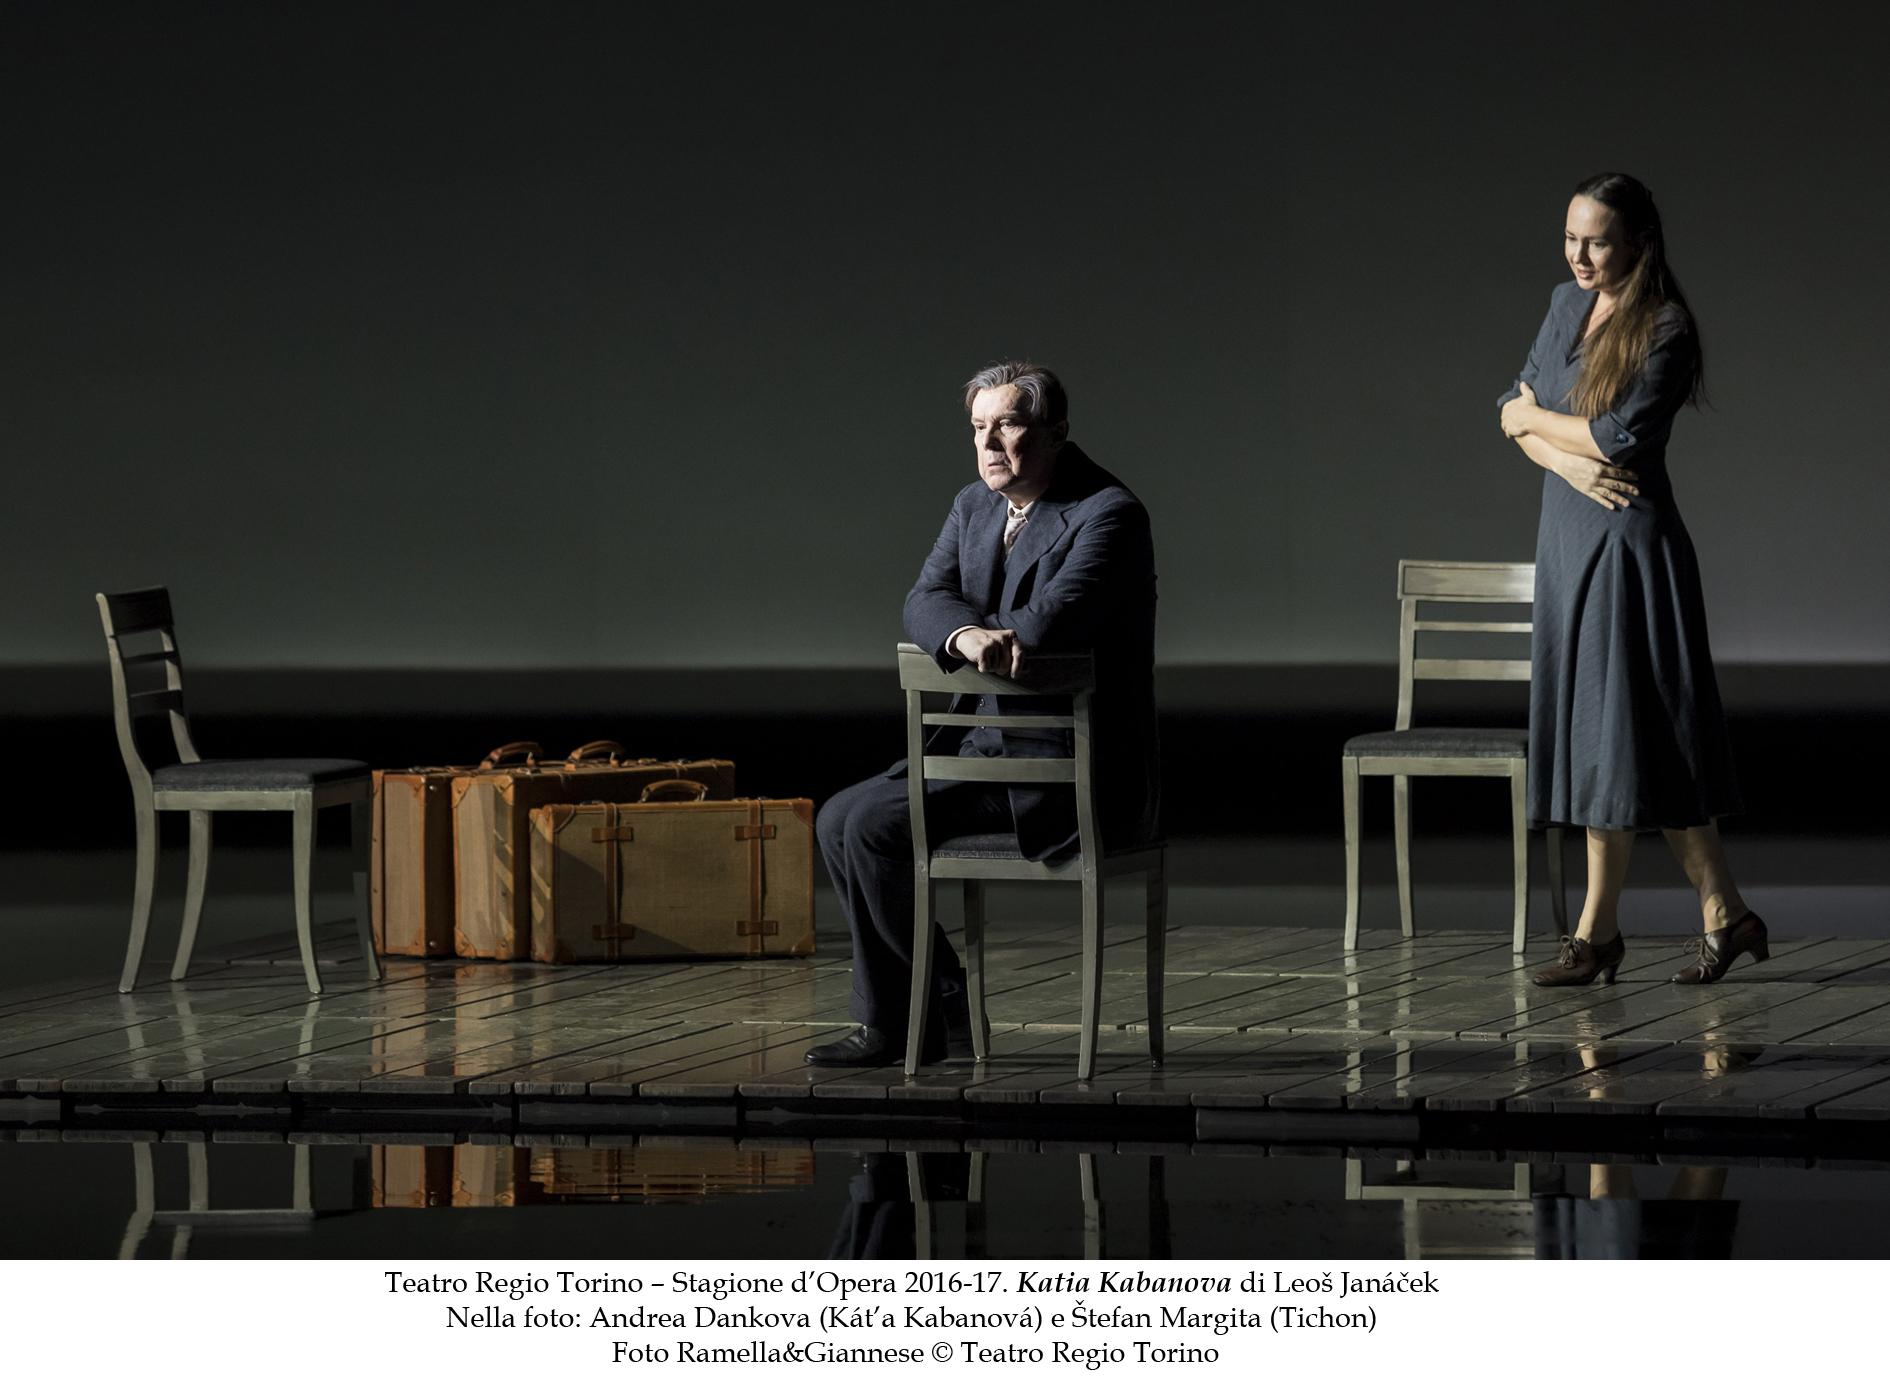 Káťa Kabanová en Turín. Foto: Ramella&Giannese - Teatro Regio Torino